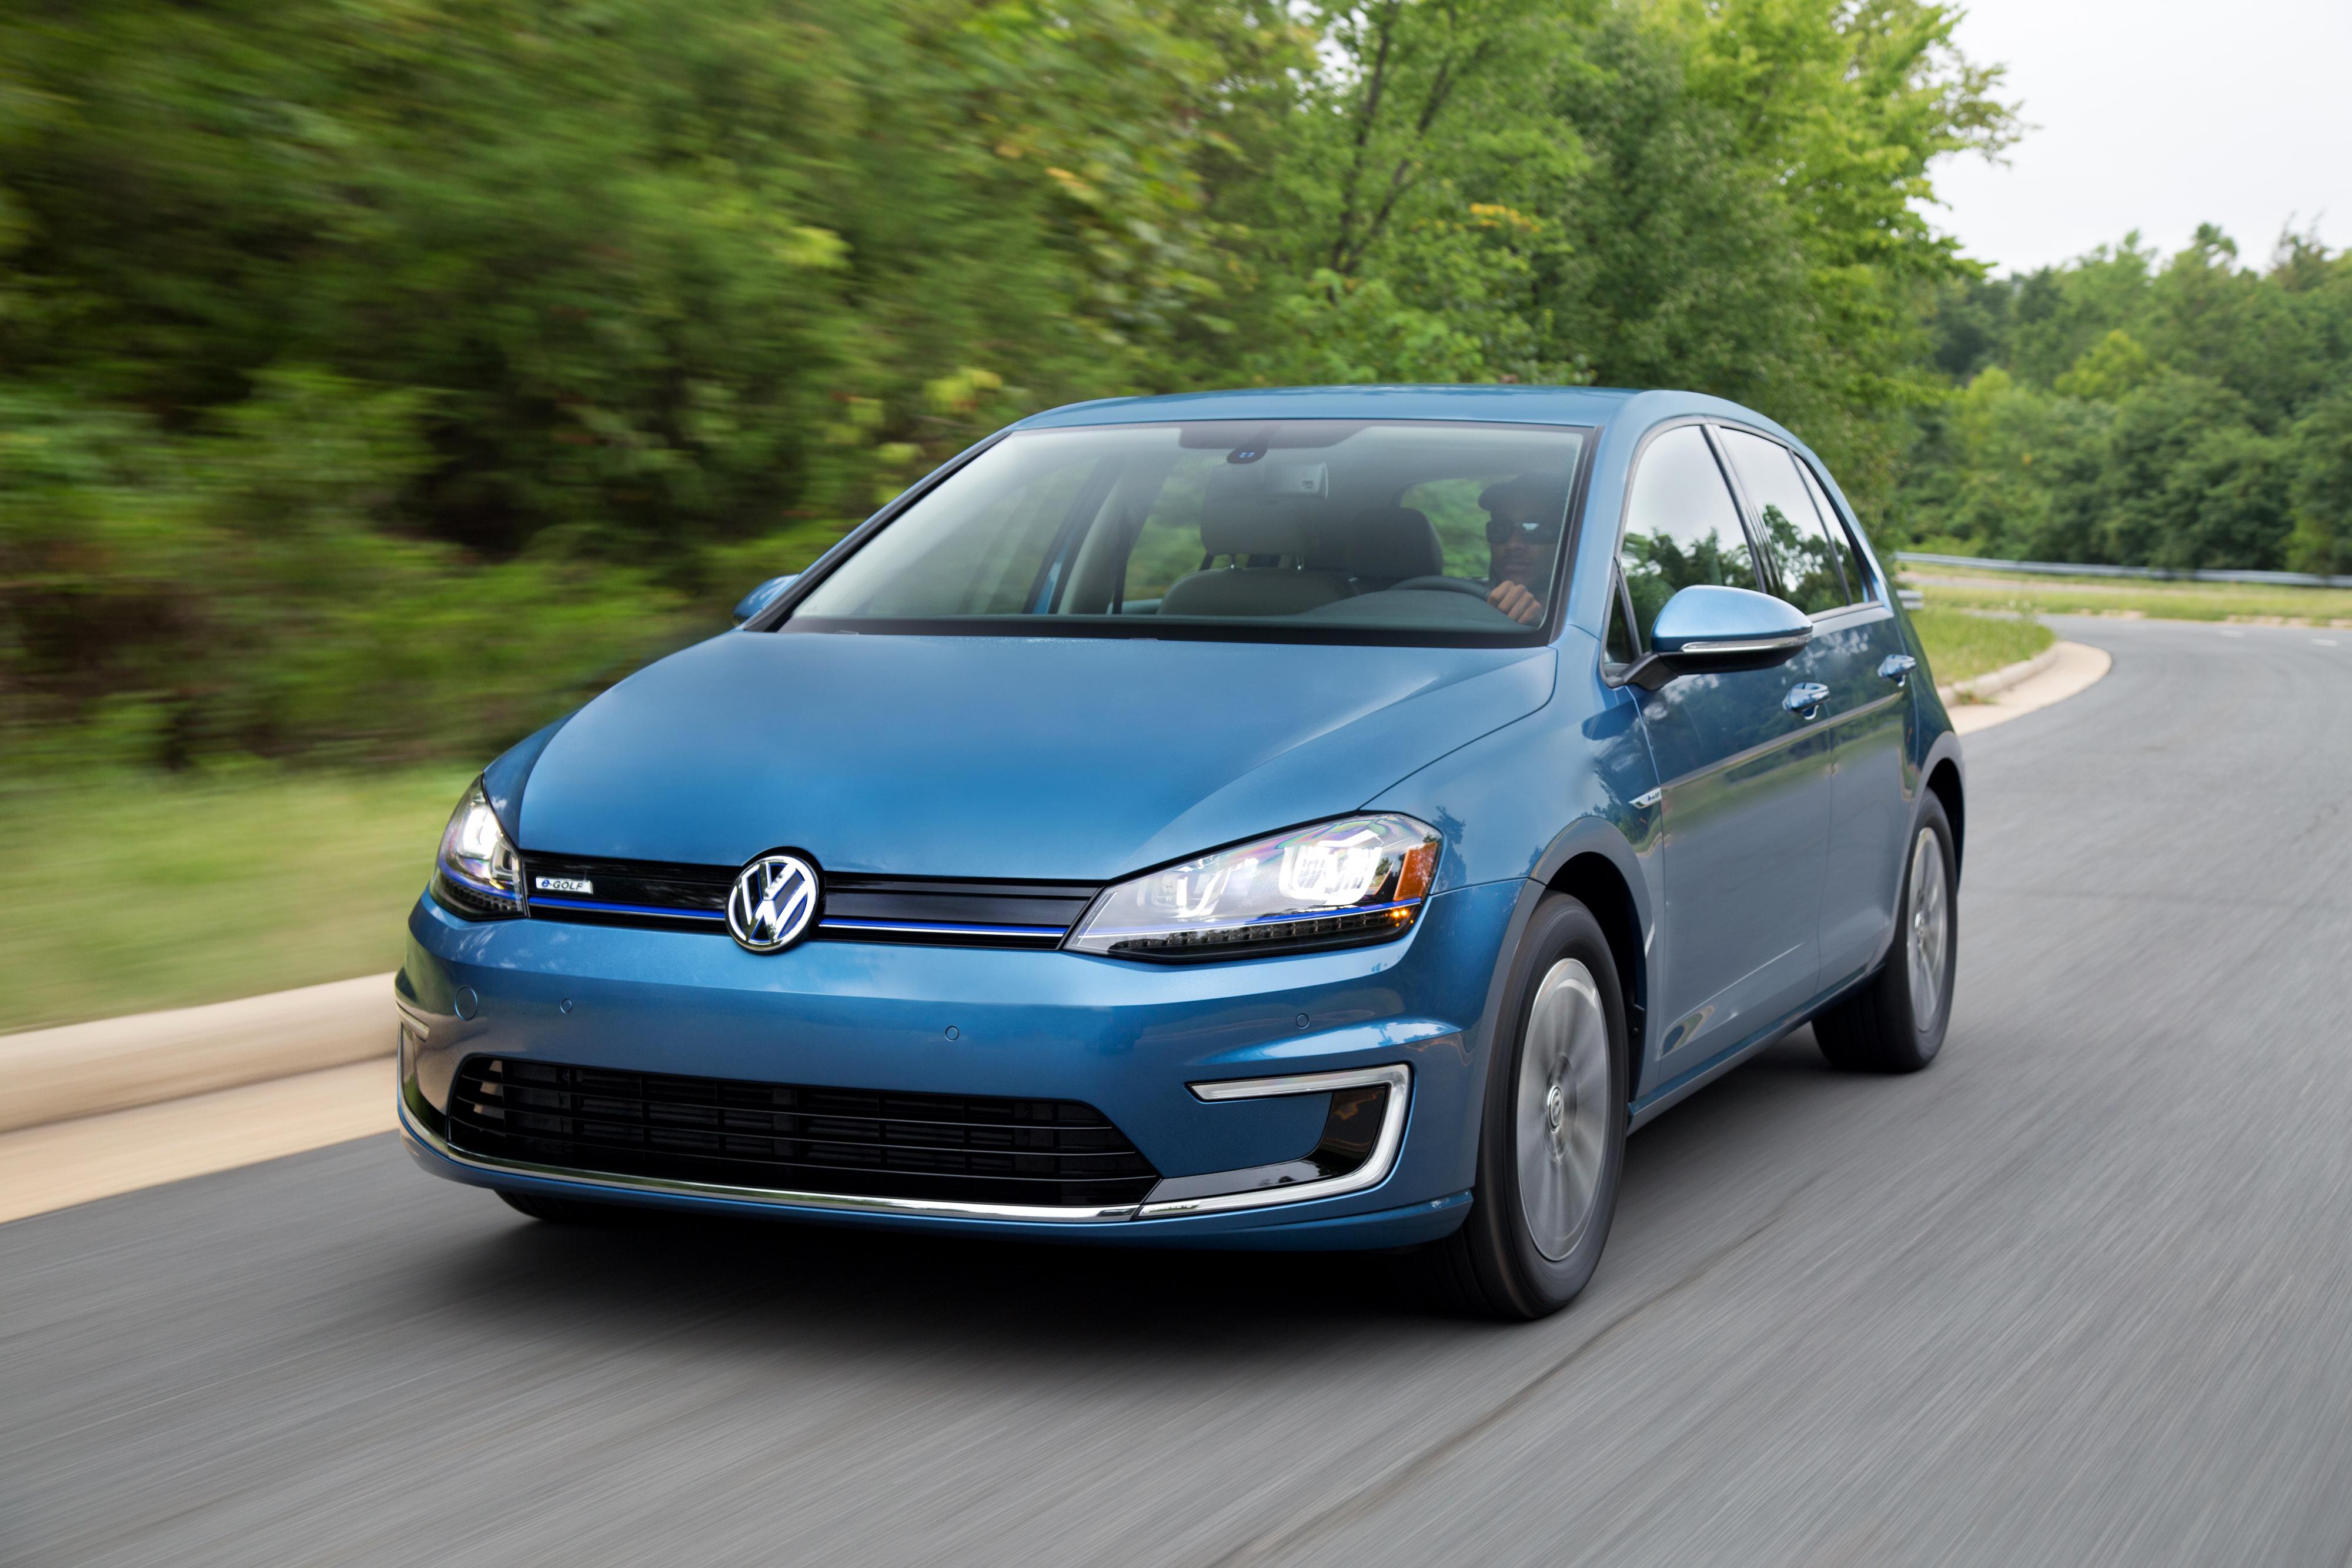 VW Invests $10 Million in EV Charging